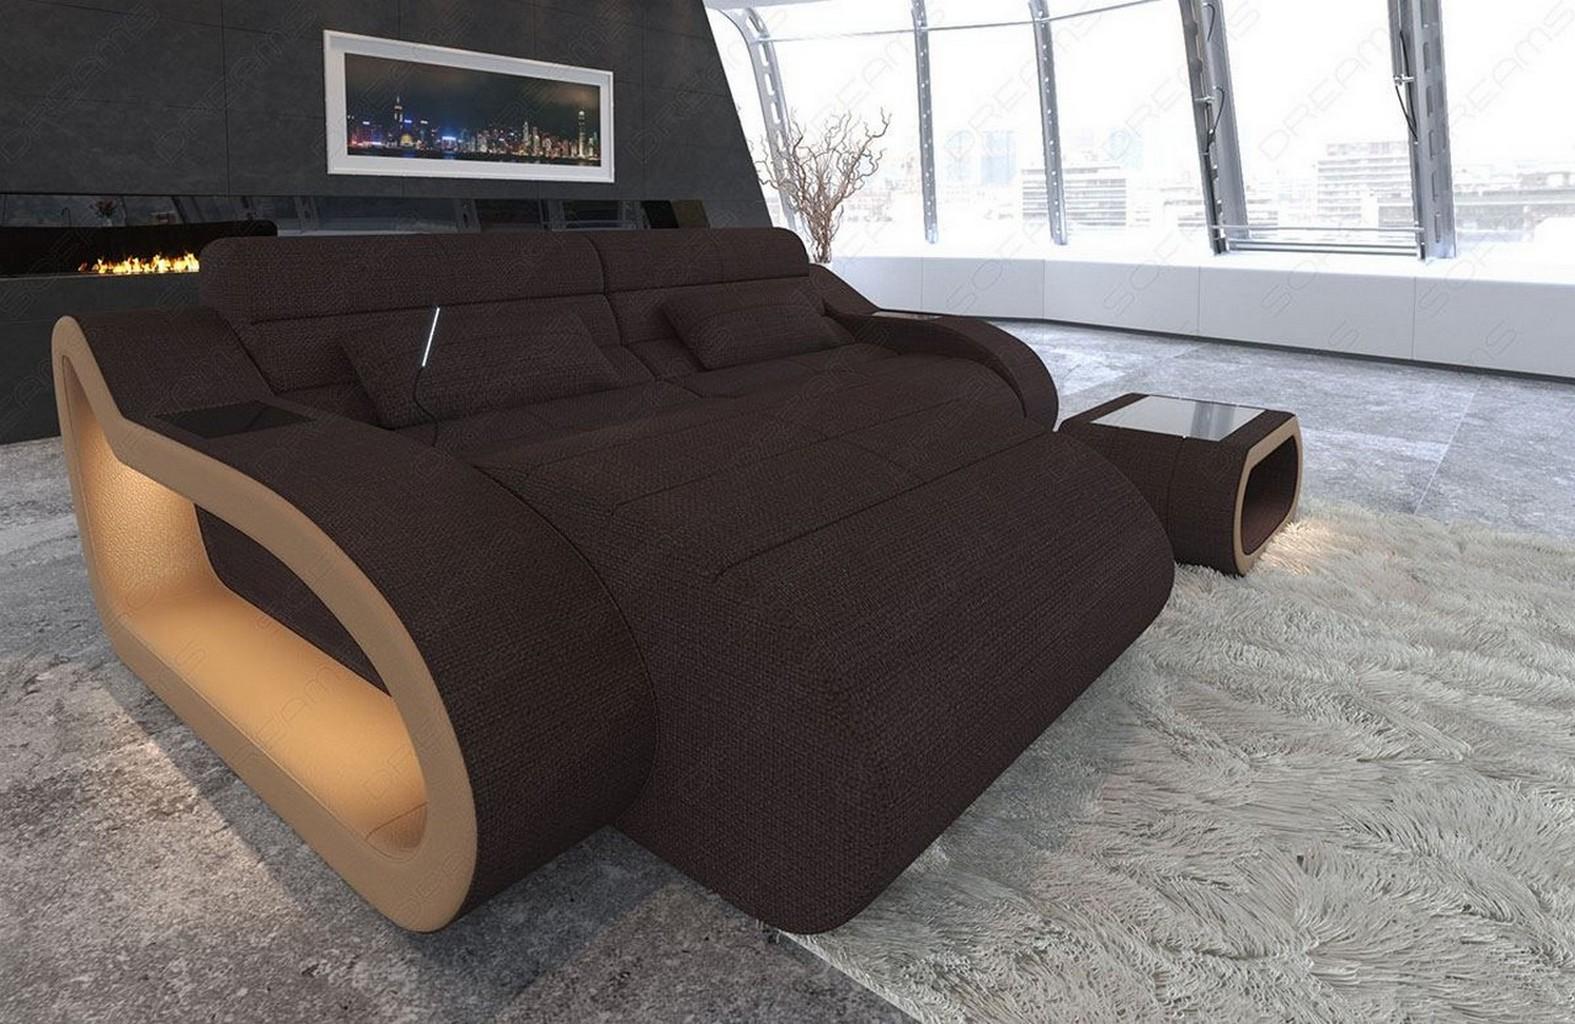 Attirant Details About Fabric Sofa Daytona L Short Shape Designer Couch With LED  Light